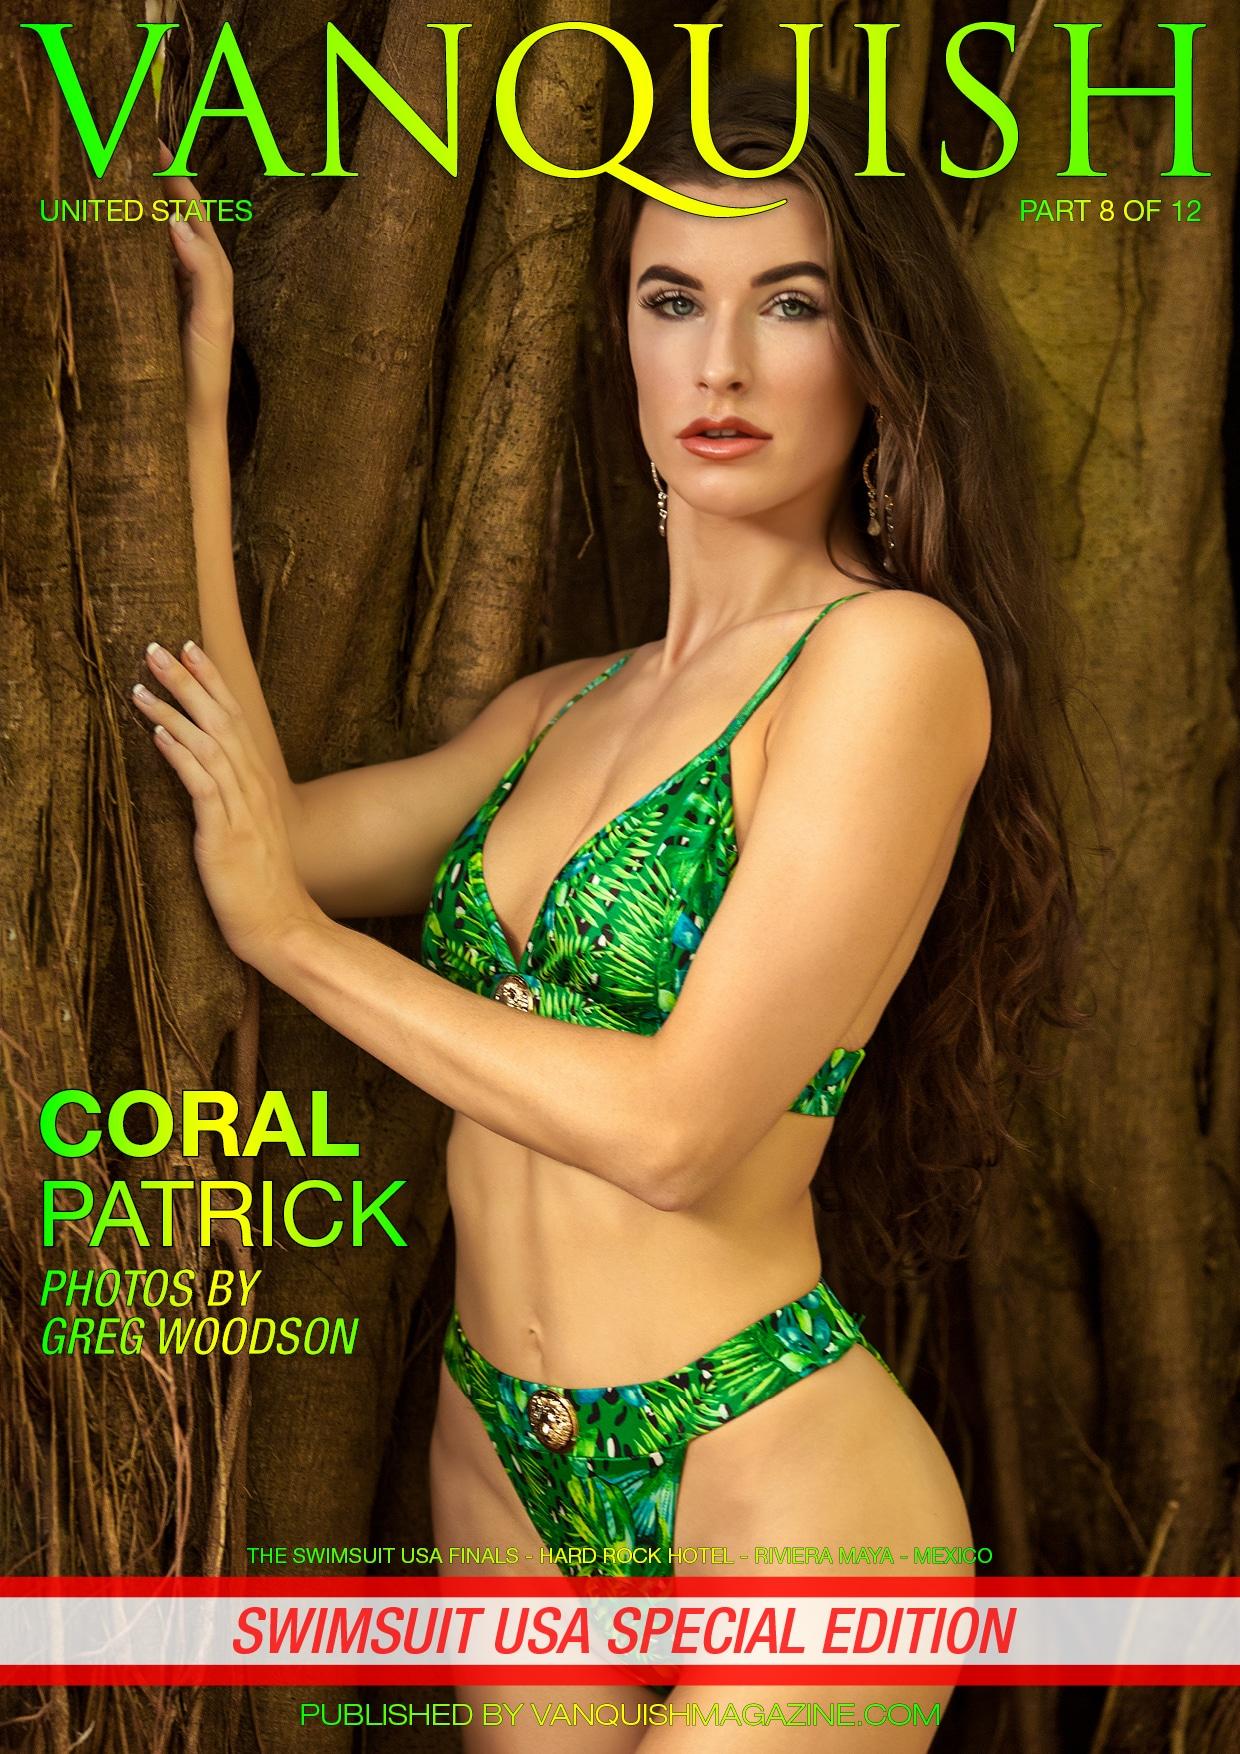 Vanquish Magazine - Swimsuit USA 2018 - Part 8 - Coral Patrick